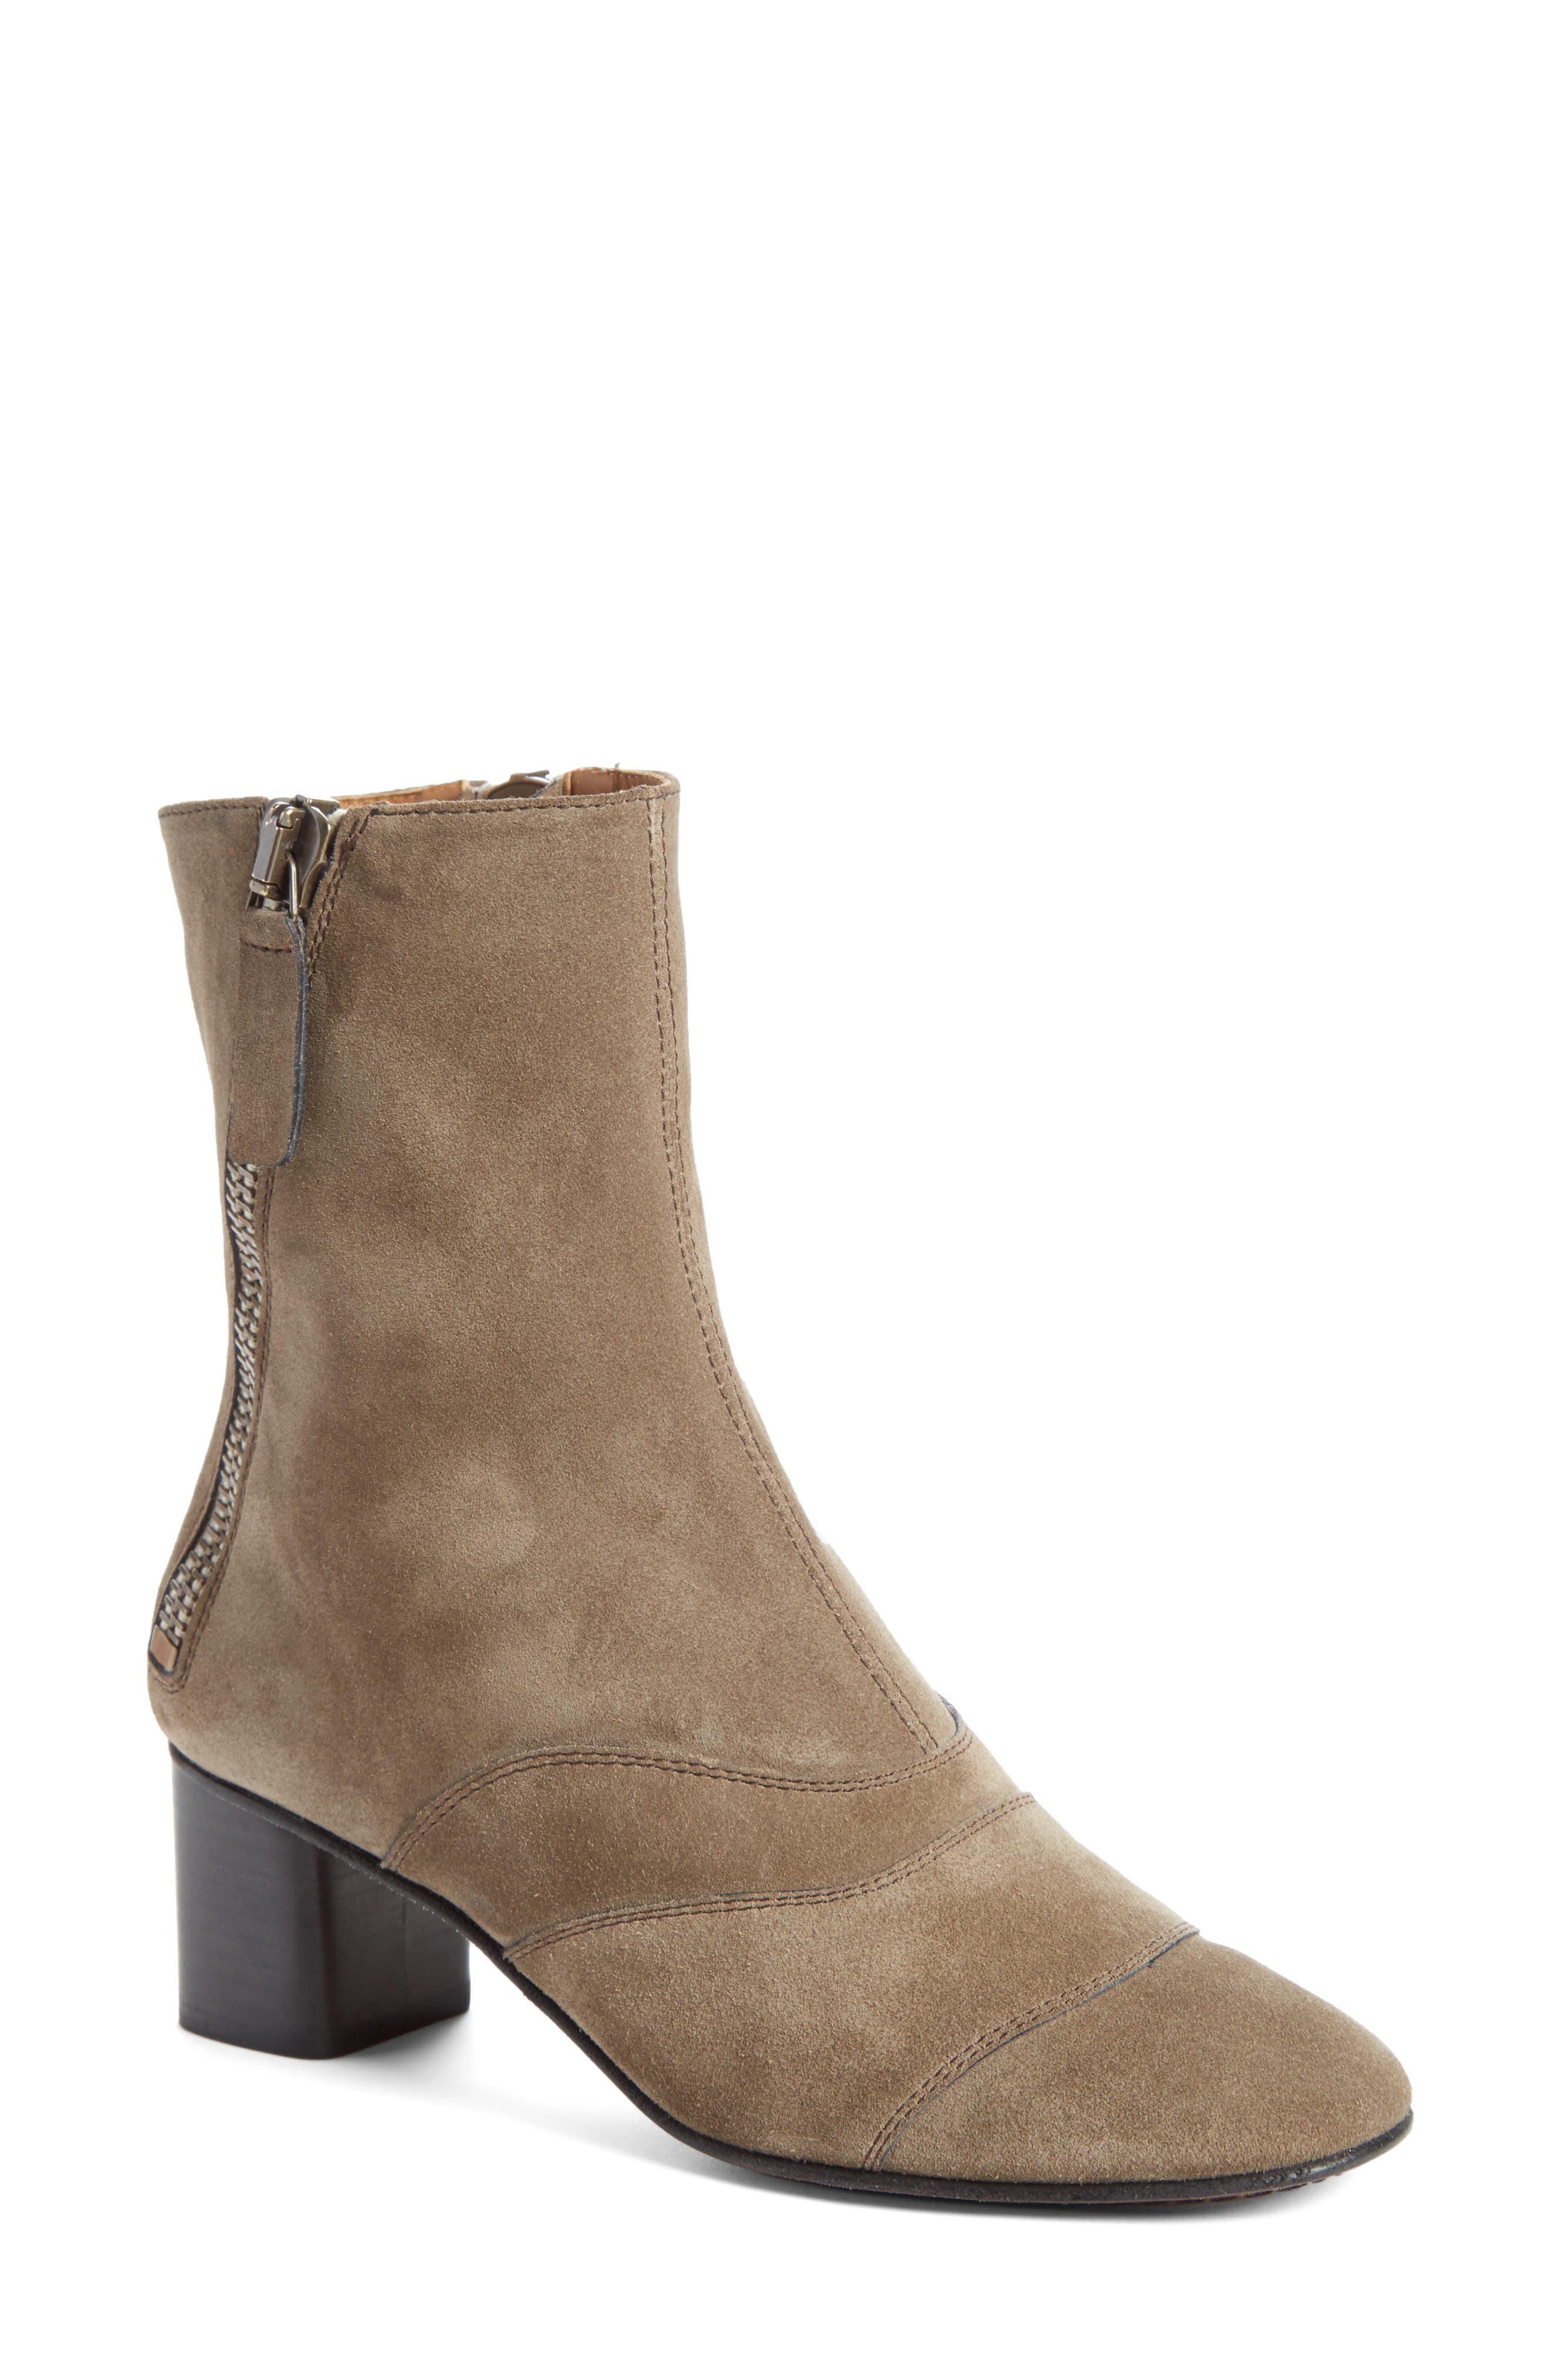 Lexie Block Heel Boot,                             Main thumbnail 1, color,                             Dark Greige